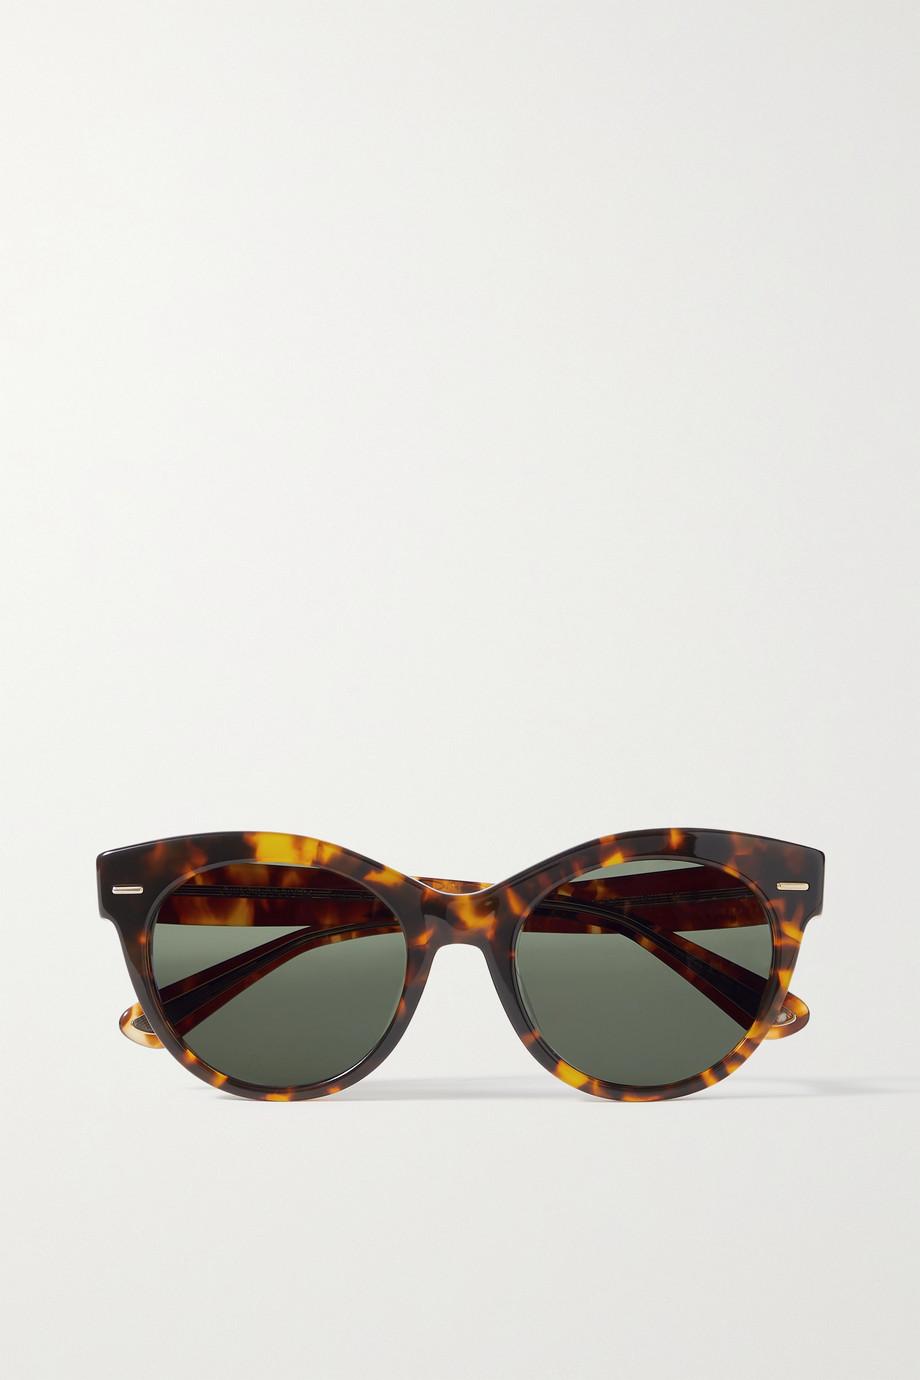 The Row + Oliver Peoples Georgica round-frame tortoiseshell acetate sunglasses